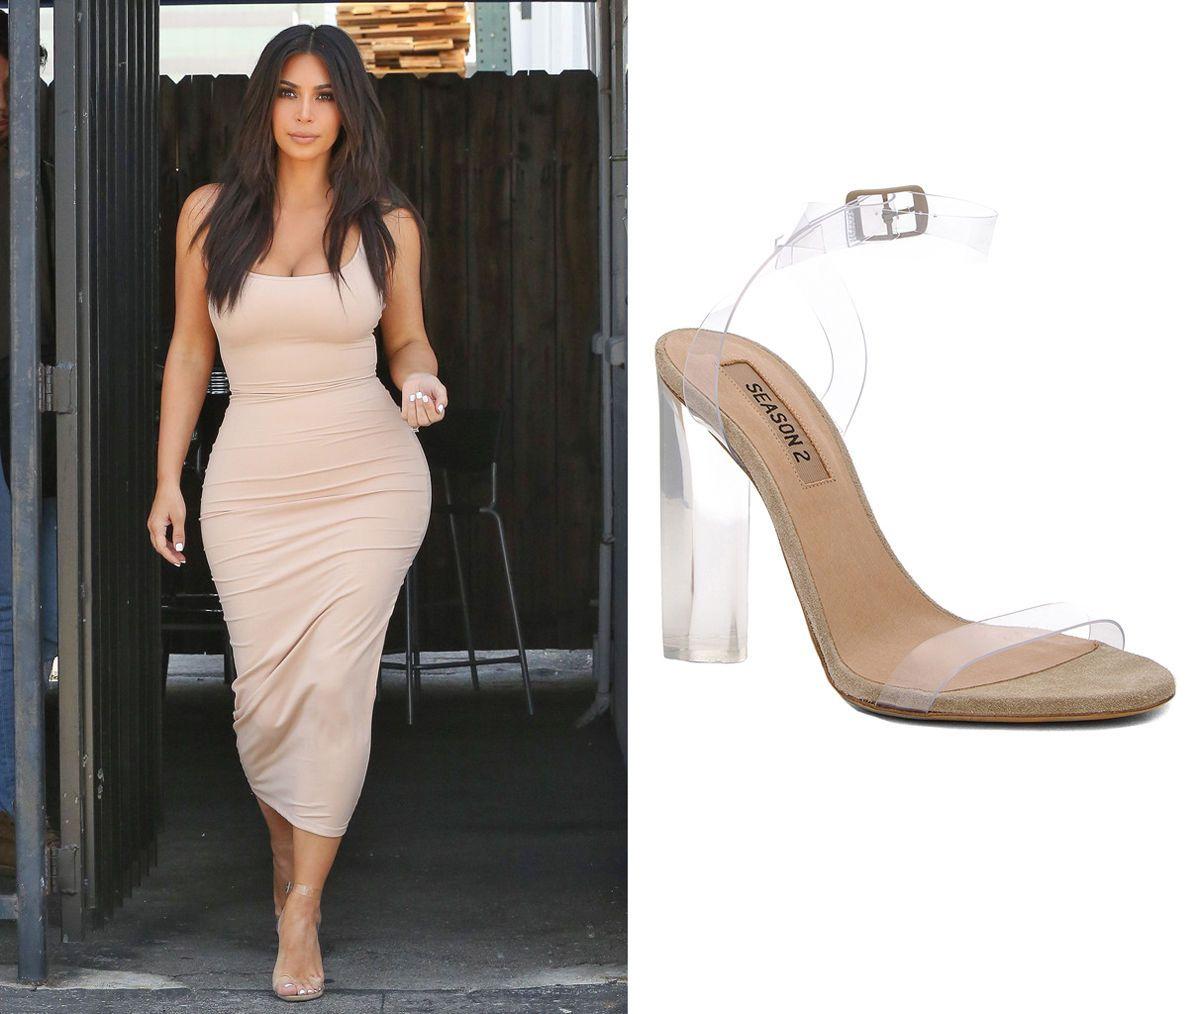 5b57c58358 Kanye West Yeezy Season 2 Lucite Kim Kardashian Shoes Sandals 38 5 8 5 Heels  | eBay